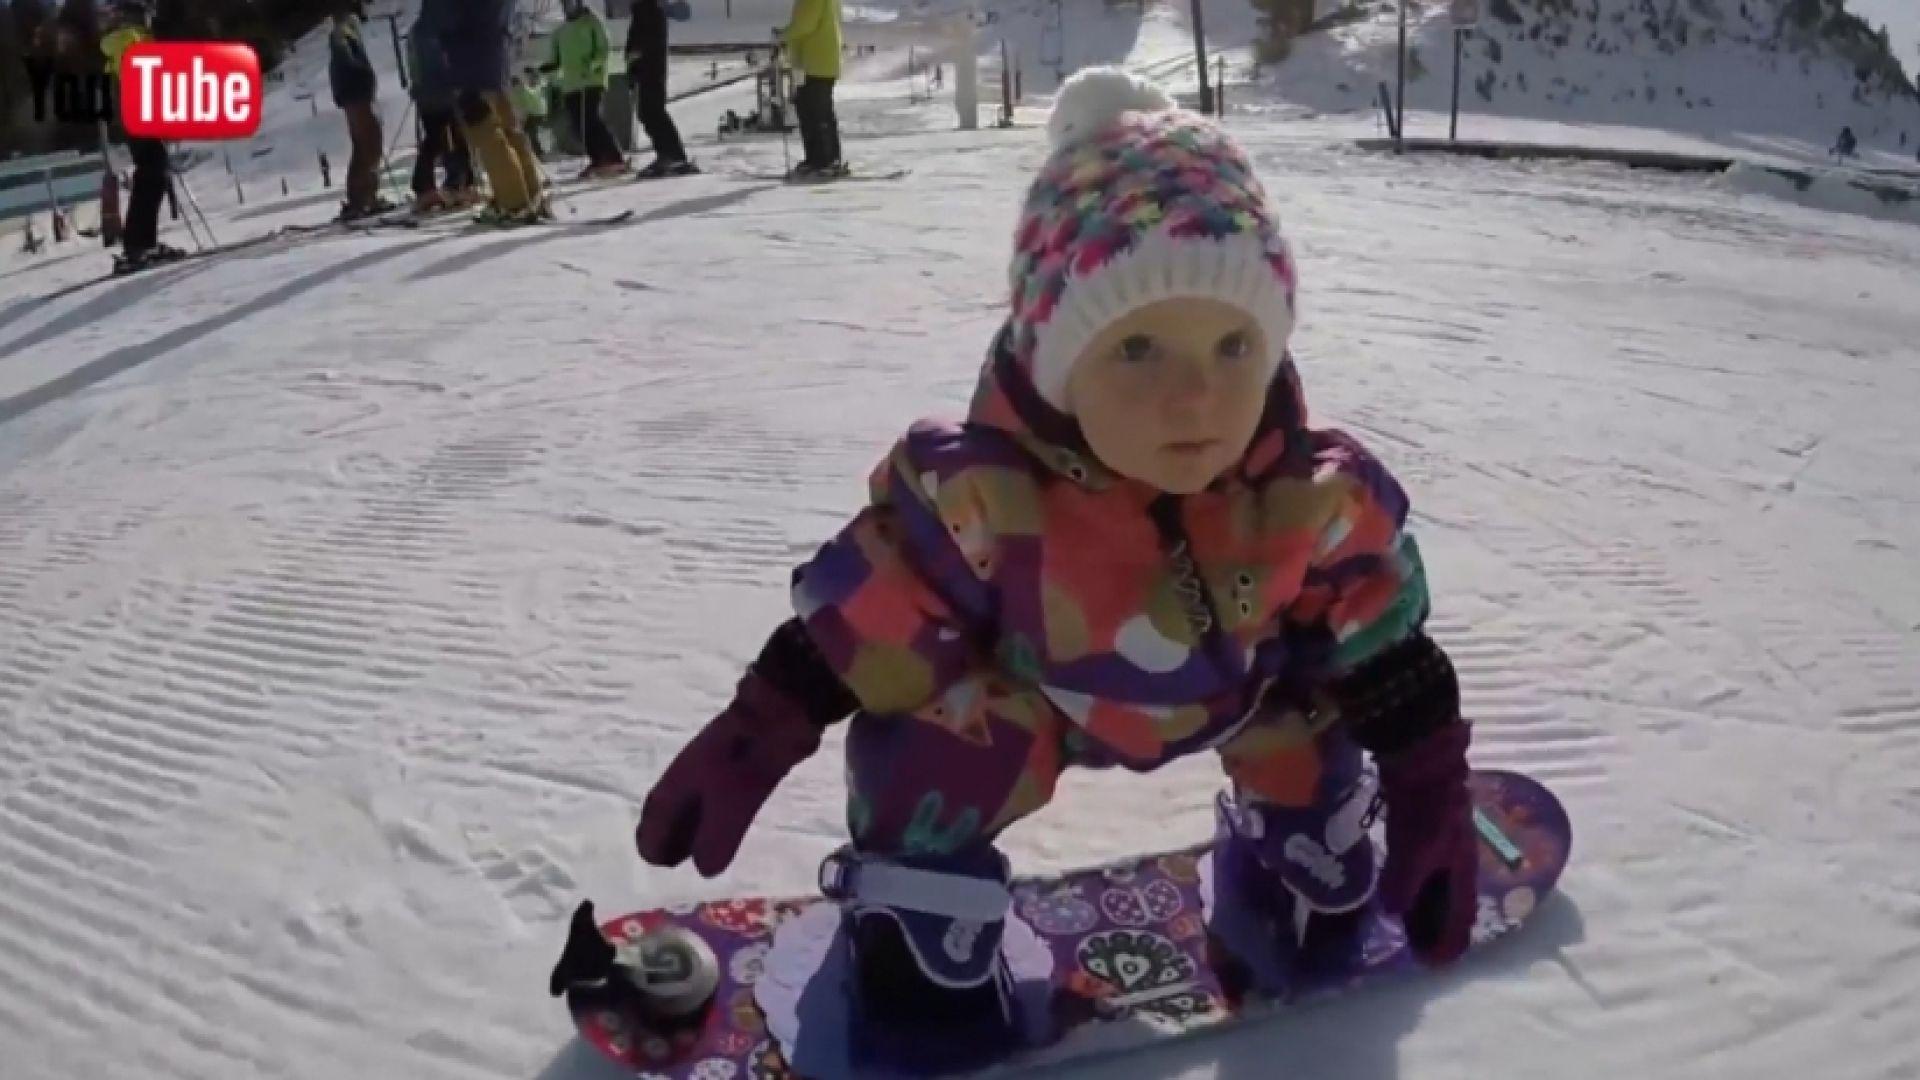 Tiny snowboarder tears up the slopes